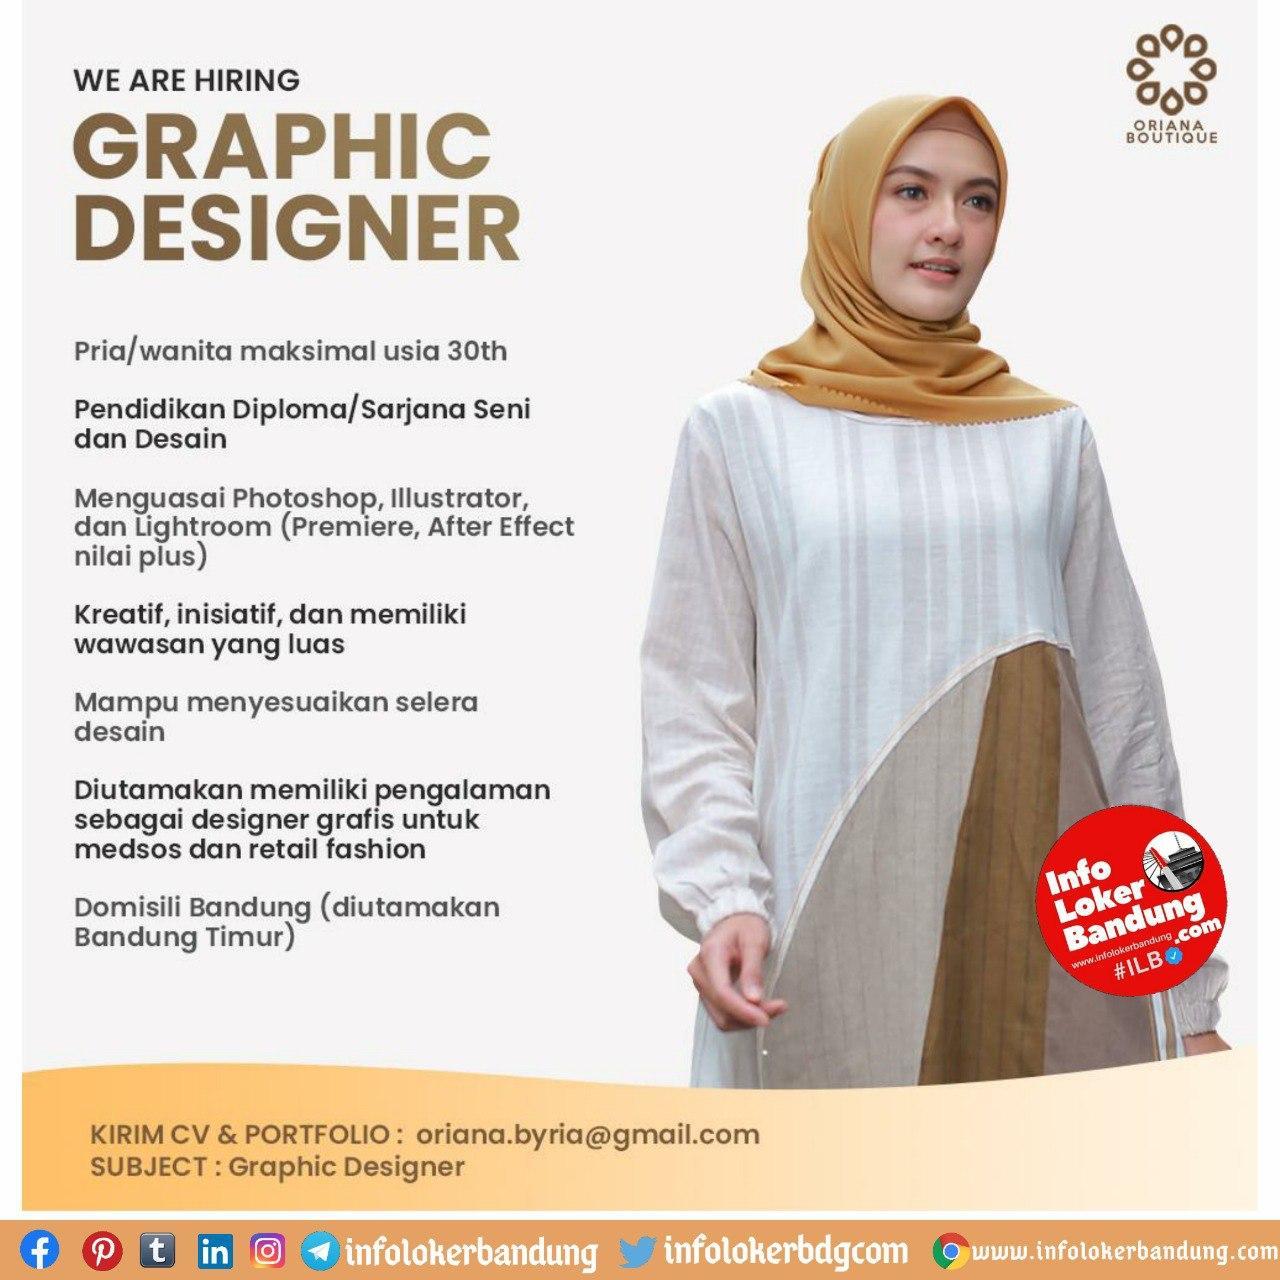 Lowongan Kerja Graphic Designer Oriana Boutique Bandung Oktober 2020